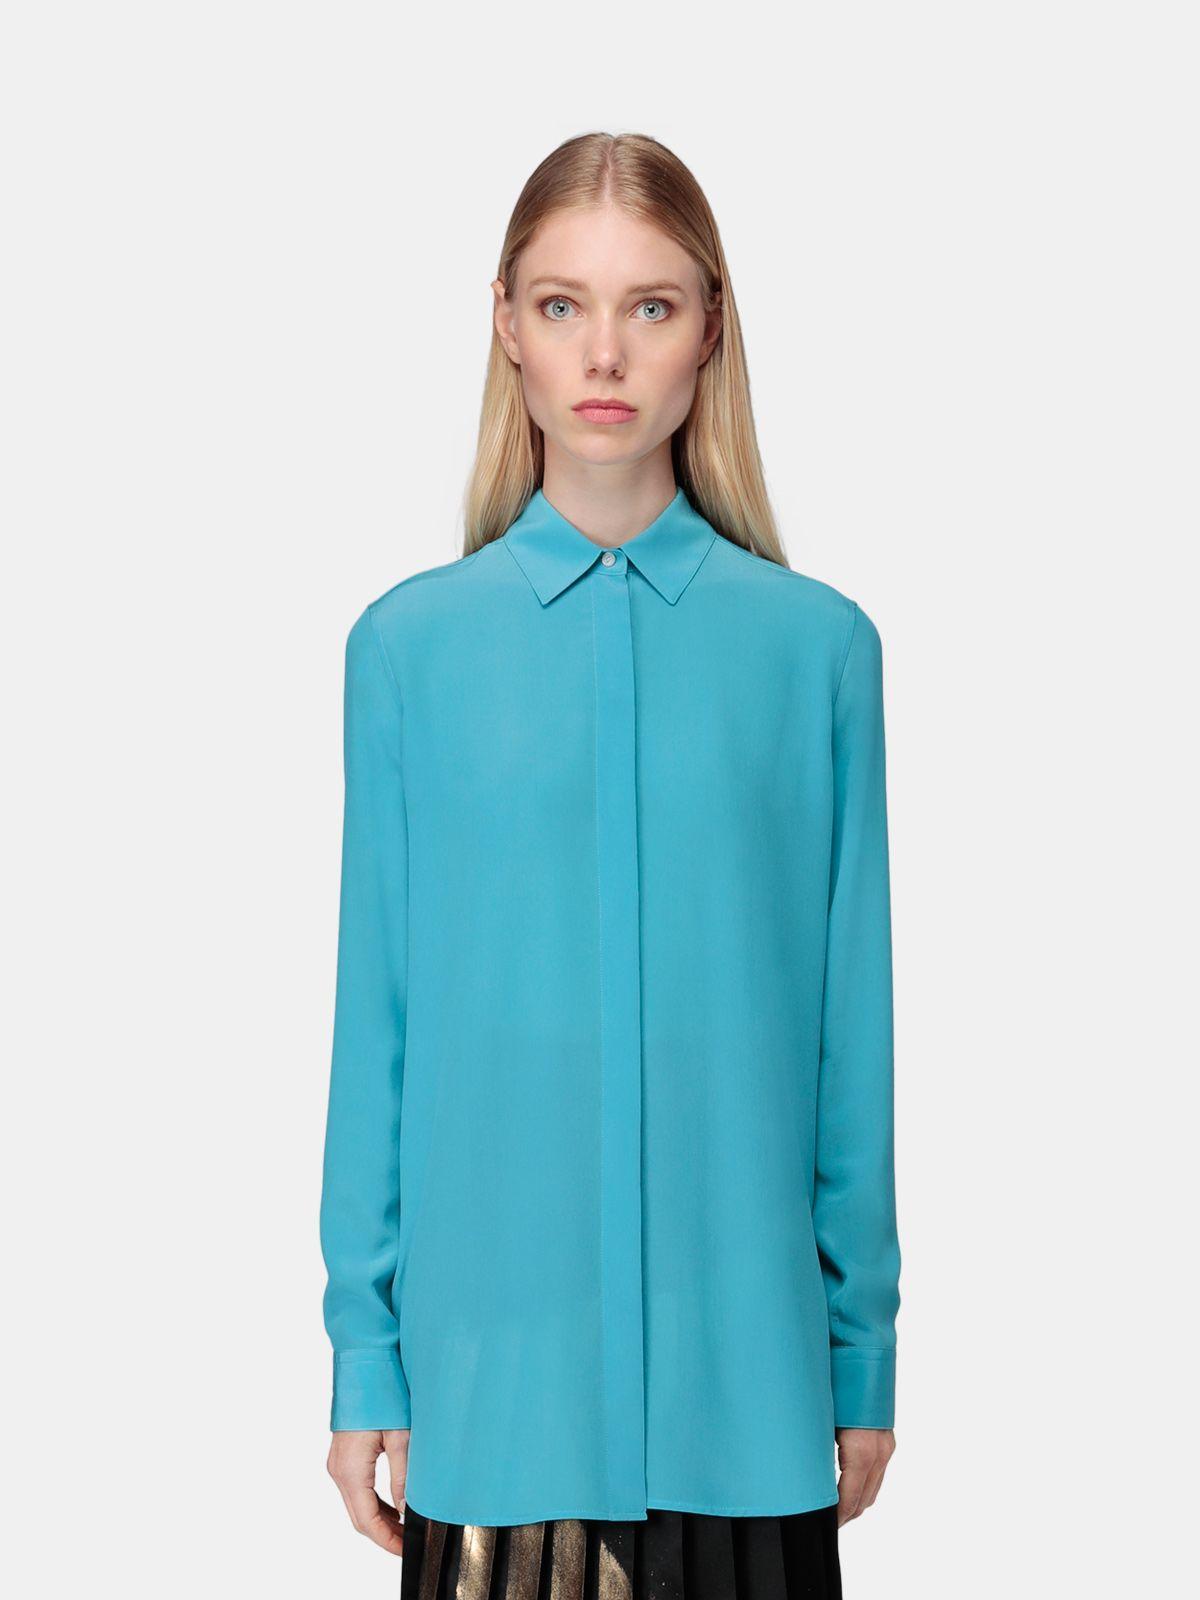 Golden Goose - Alice silk shirt in blue in